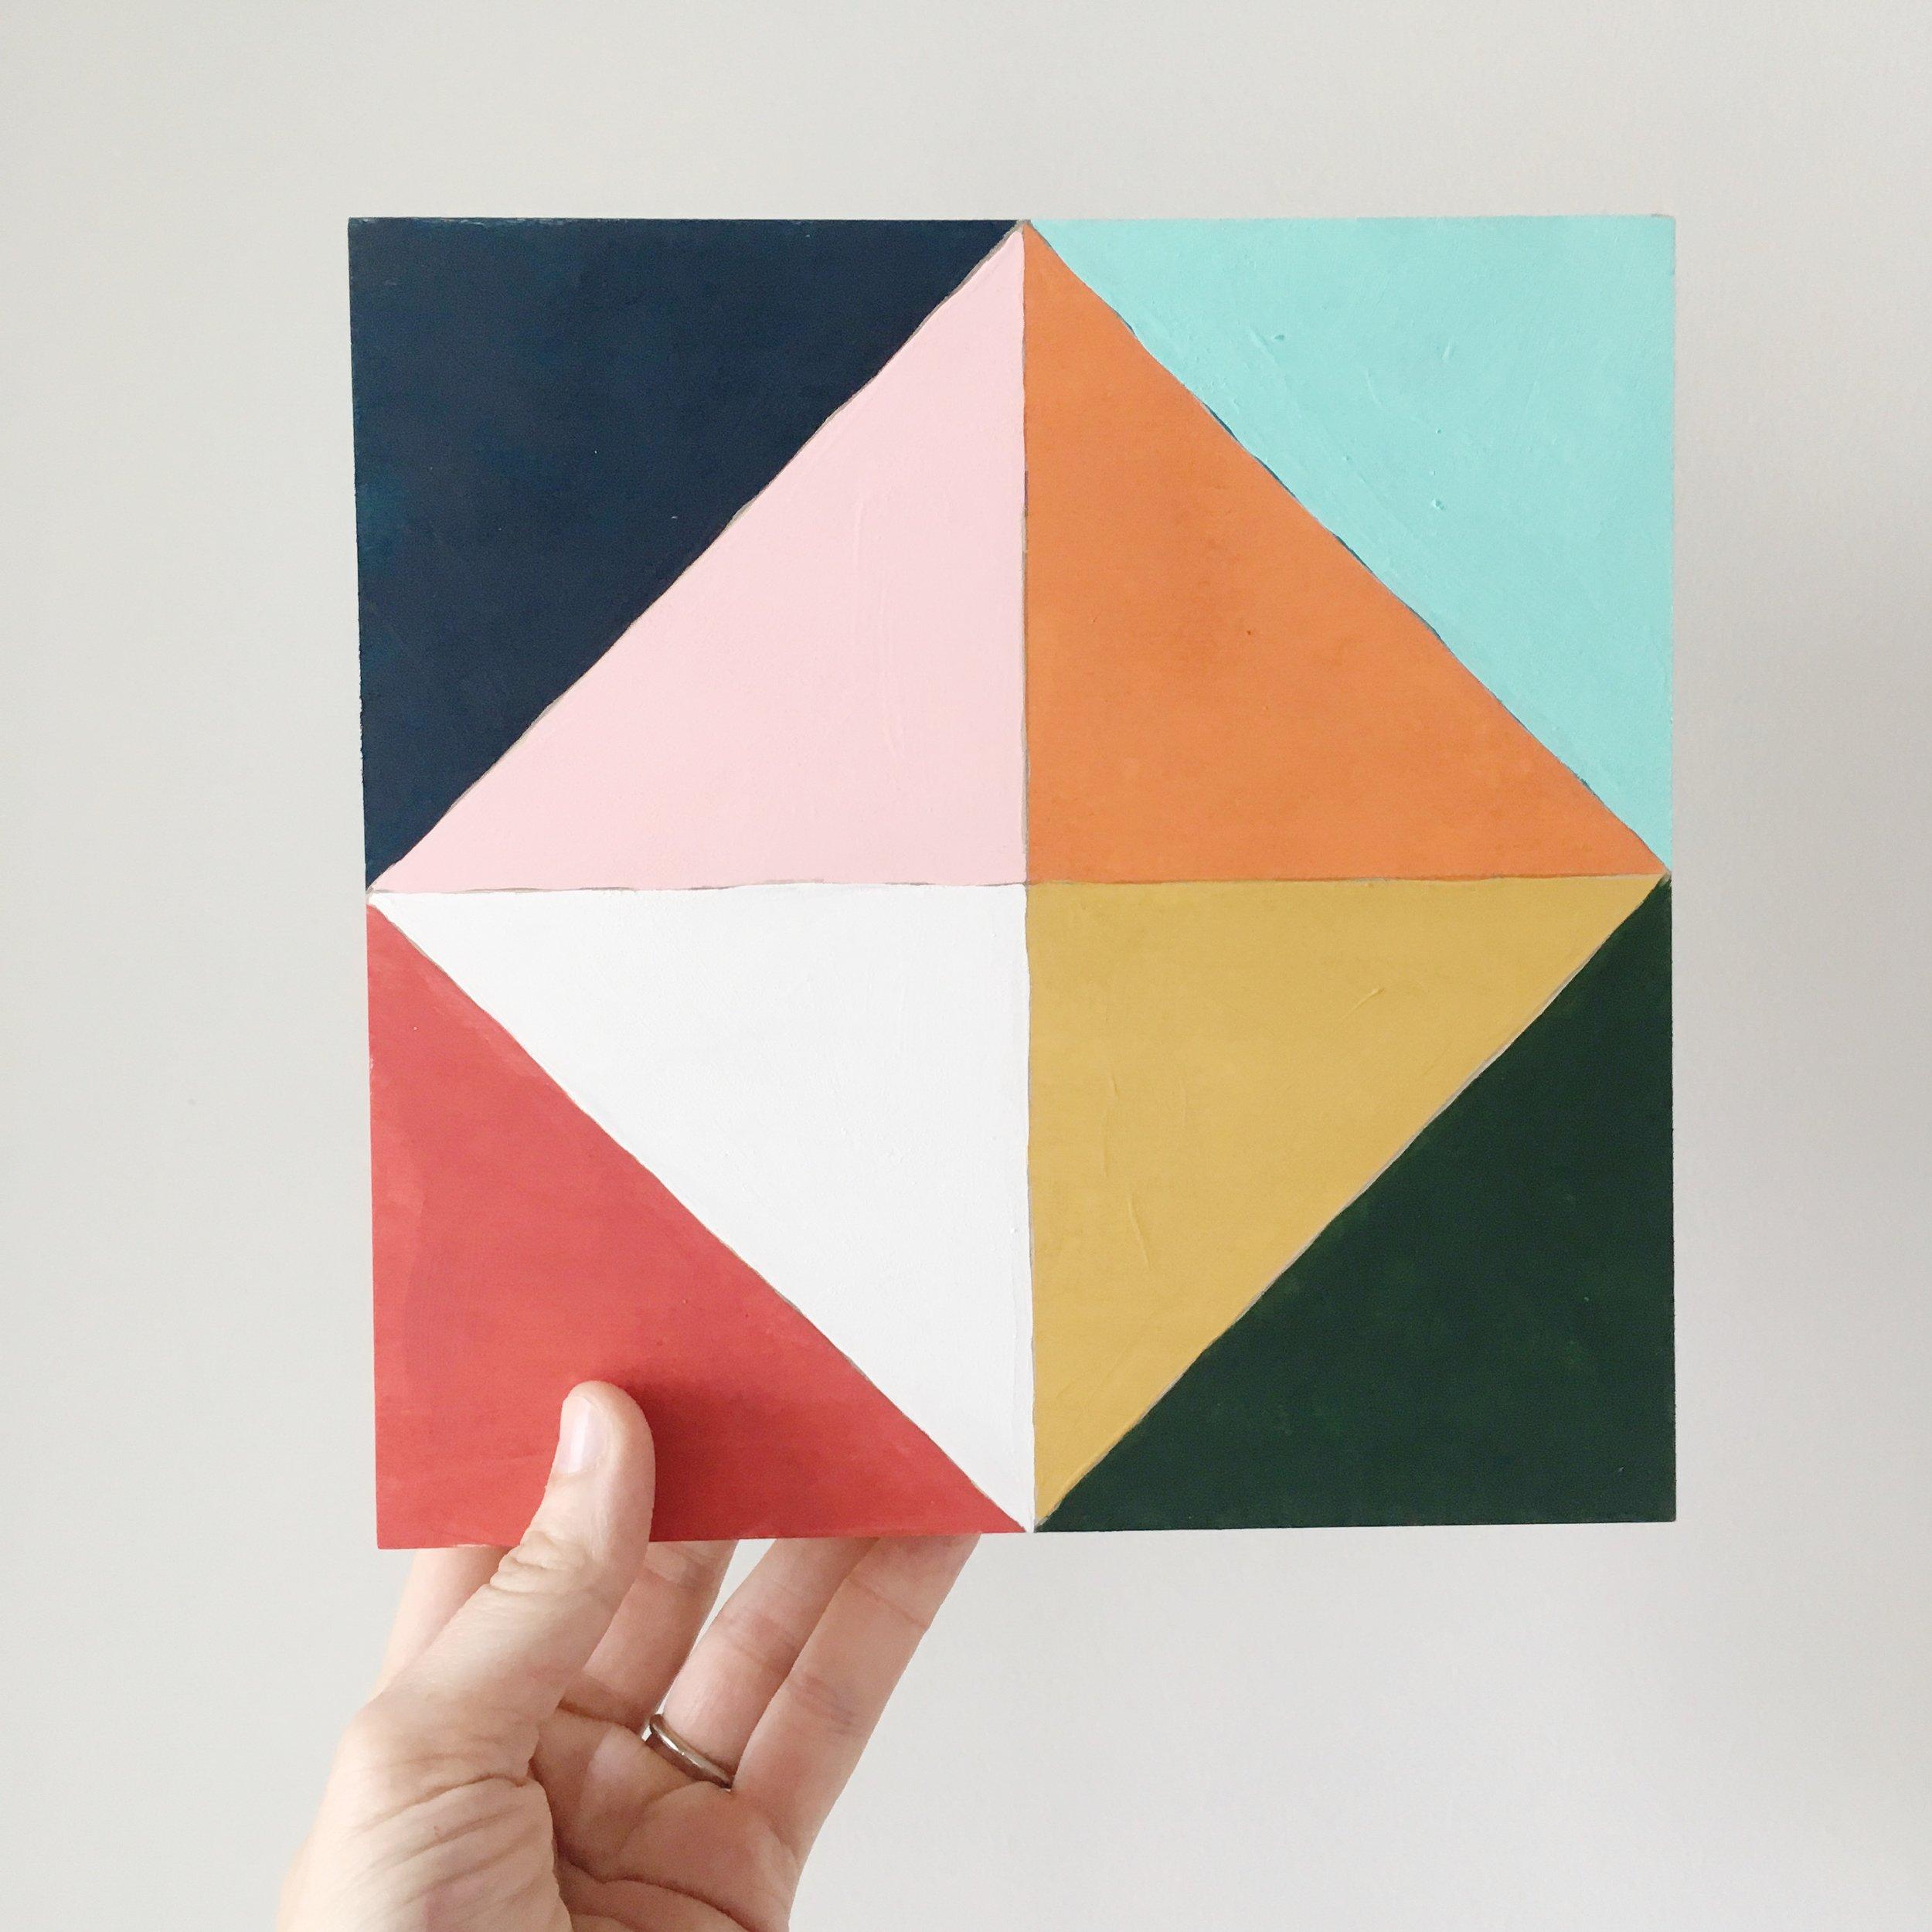 brooke petermann half square triangle painting.JPG